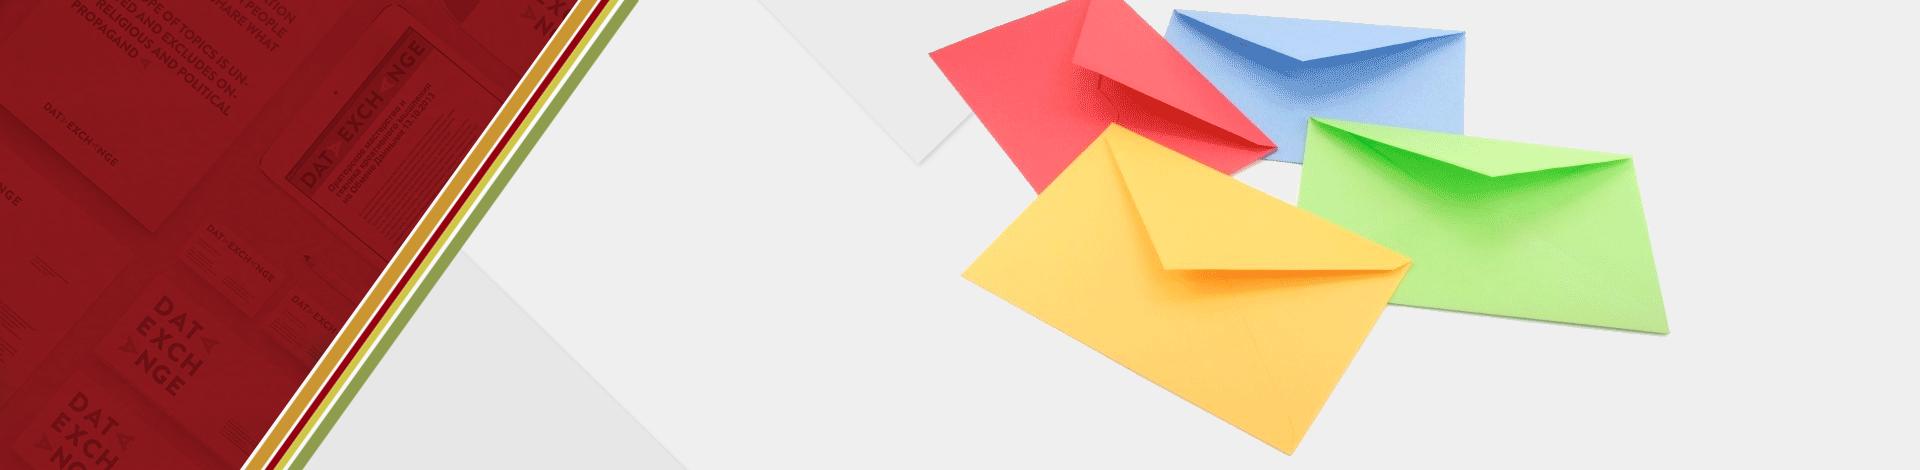 бумажные пакеты из бумаги с логотипом на заказ